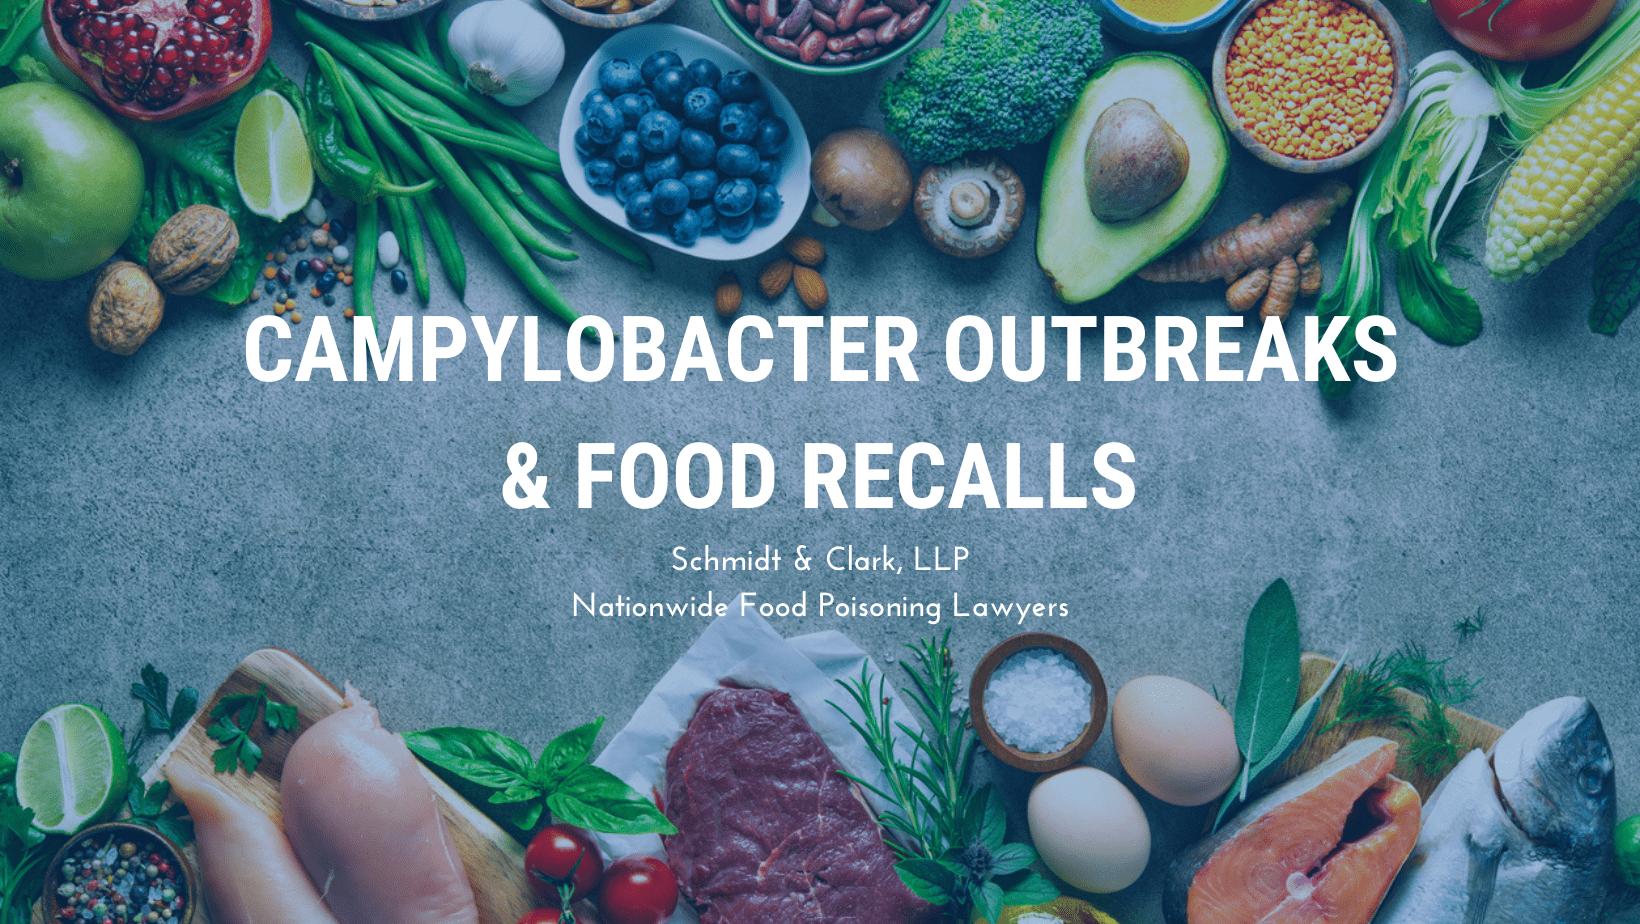 Campylobacter Outbreaks Food Recalls